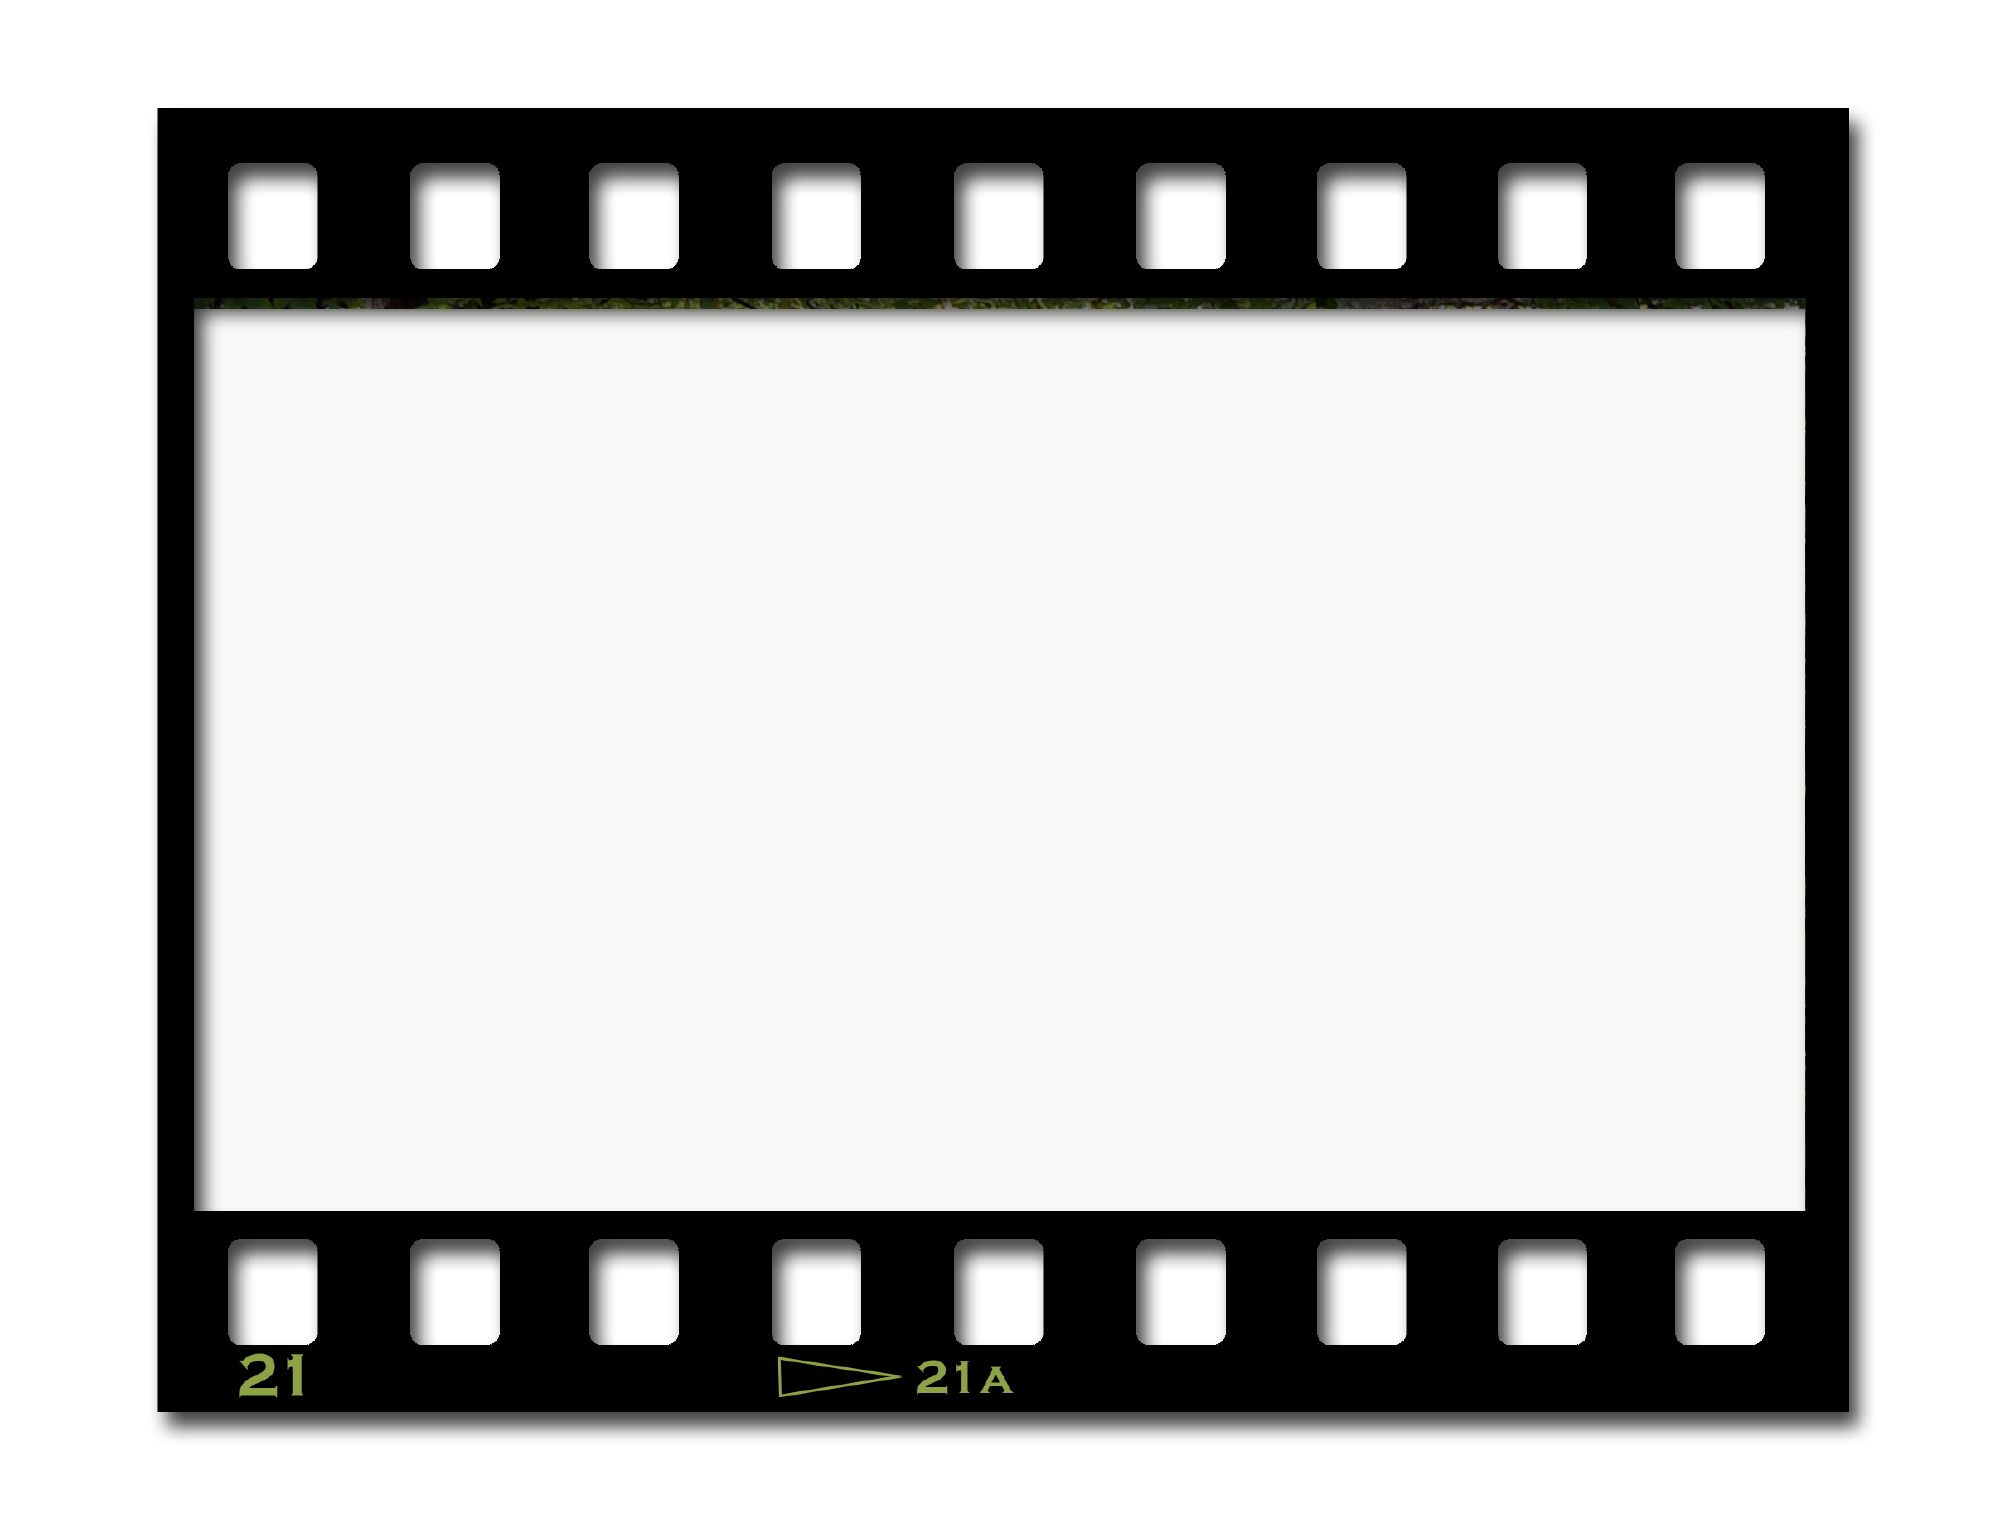 http://timvandevall.com/blank-film-strip-templates/ | Misc ...